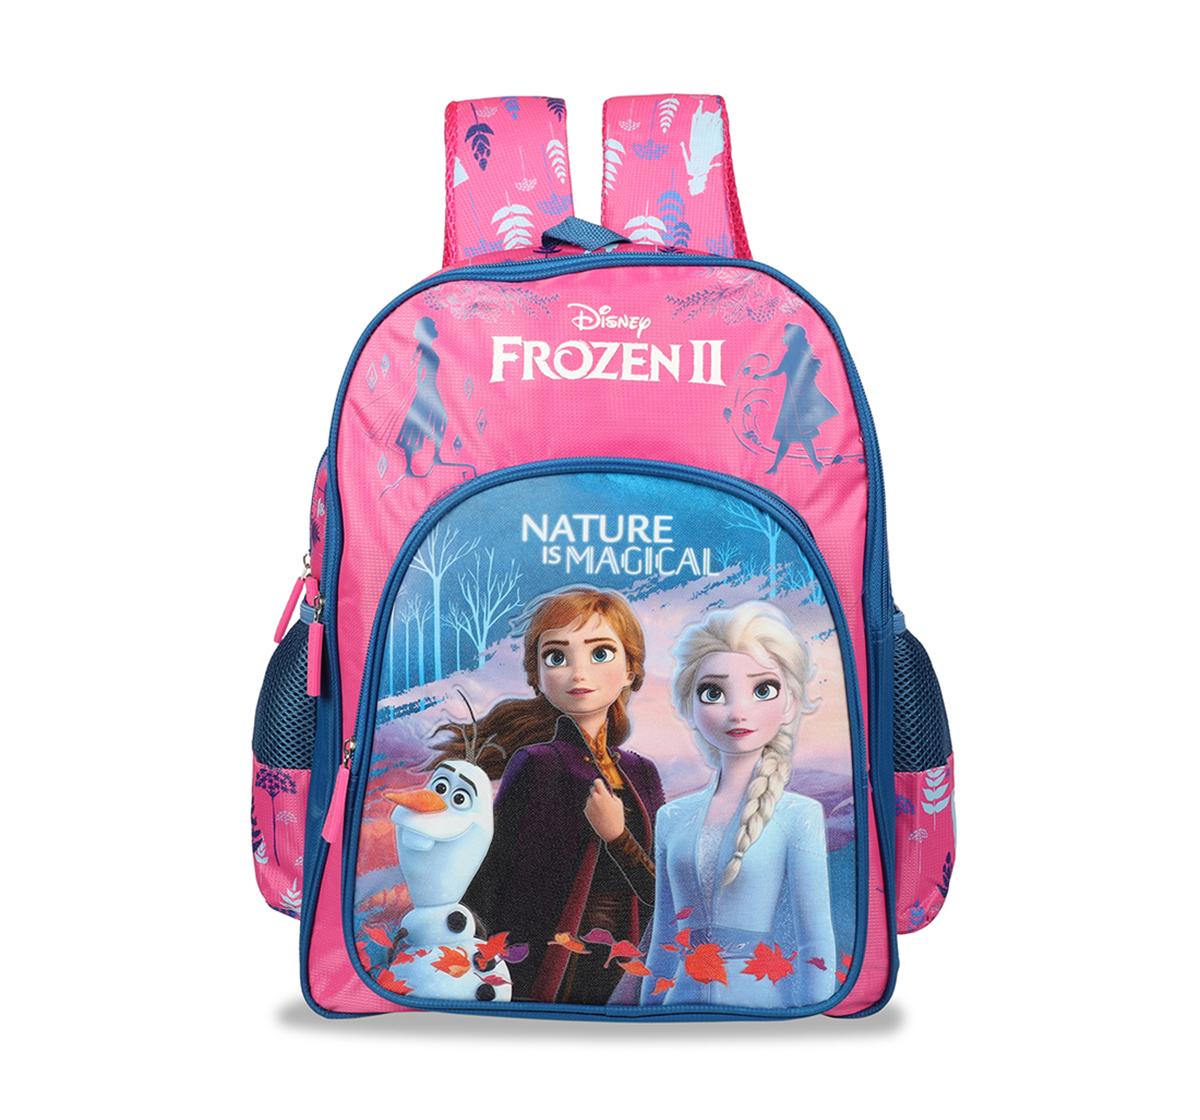 Disney | Disney Frozen2 Nature Is Magical School Bag 46 Cm Bags for Girls age 10Y+